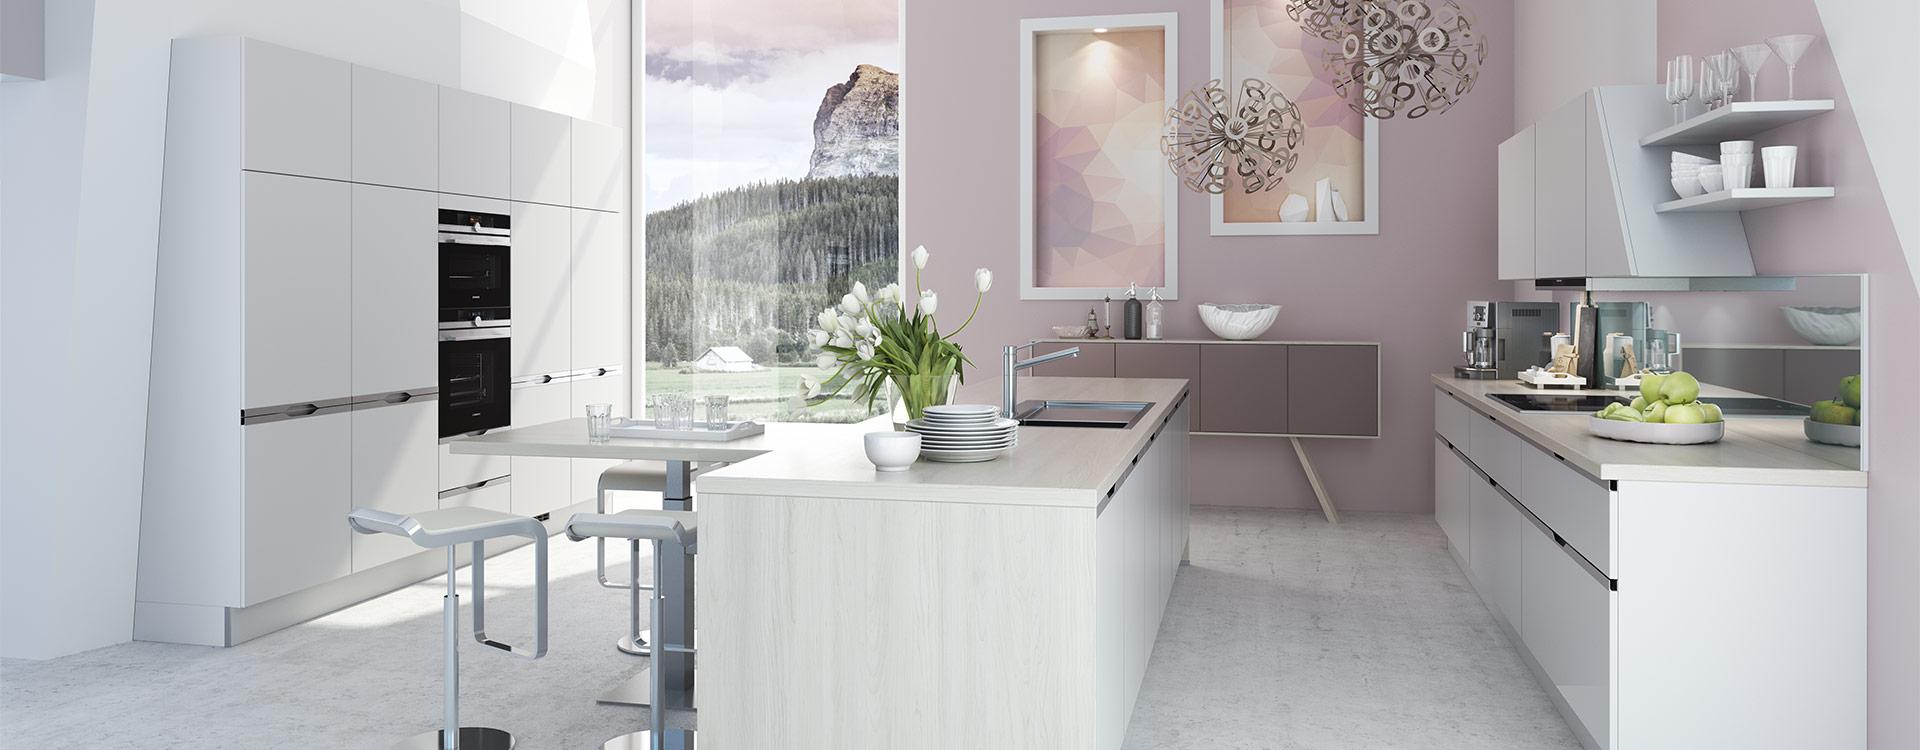 Brigitte Keukens Pure Emotie keuken